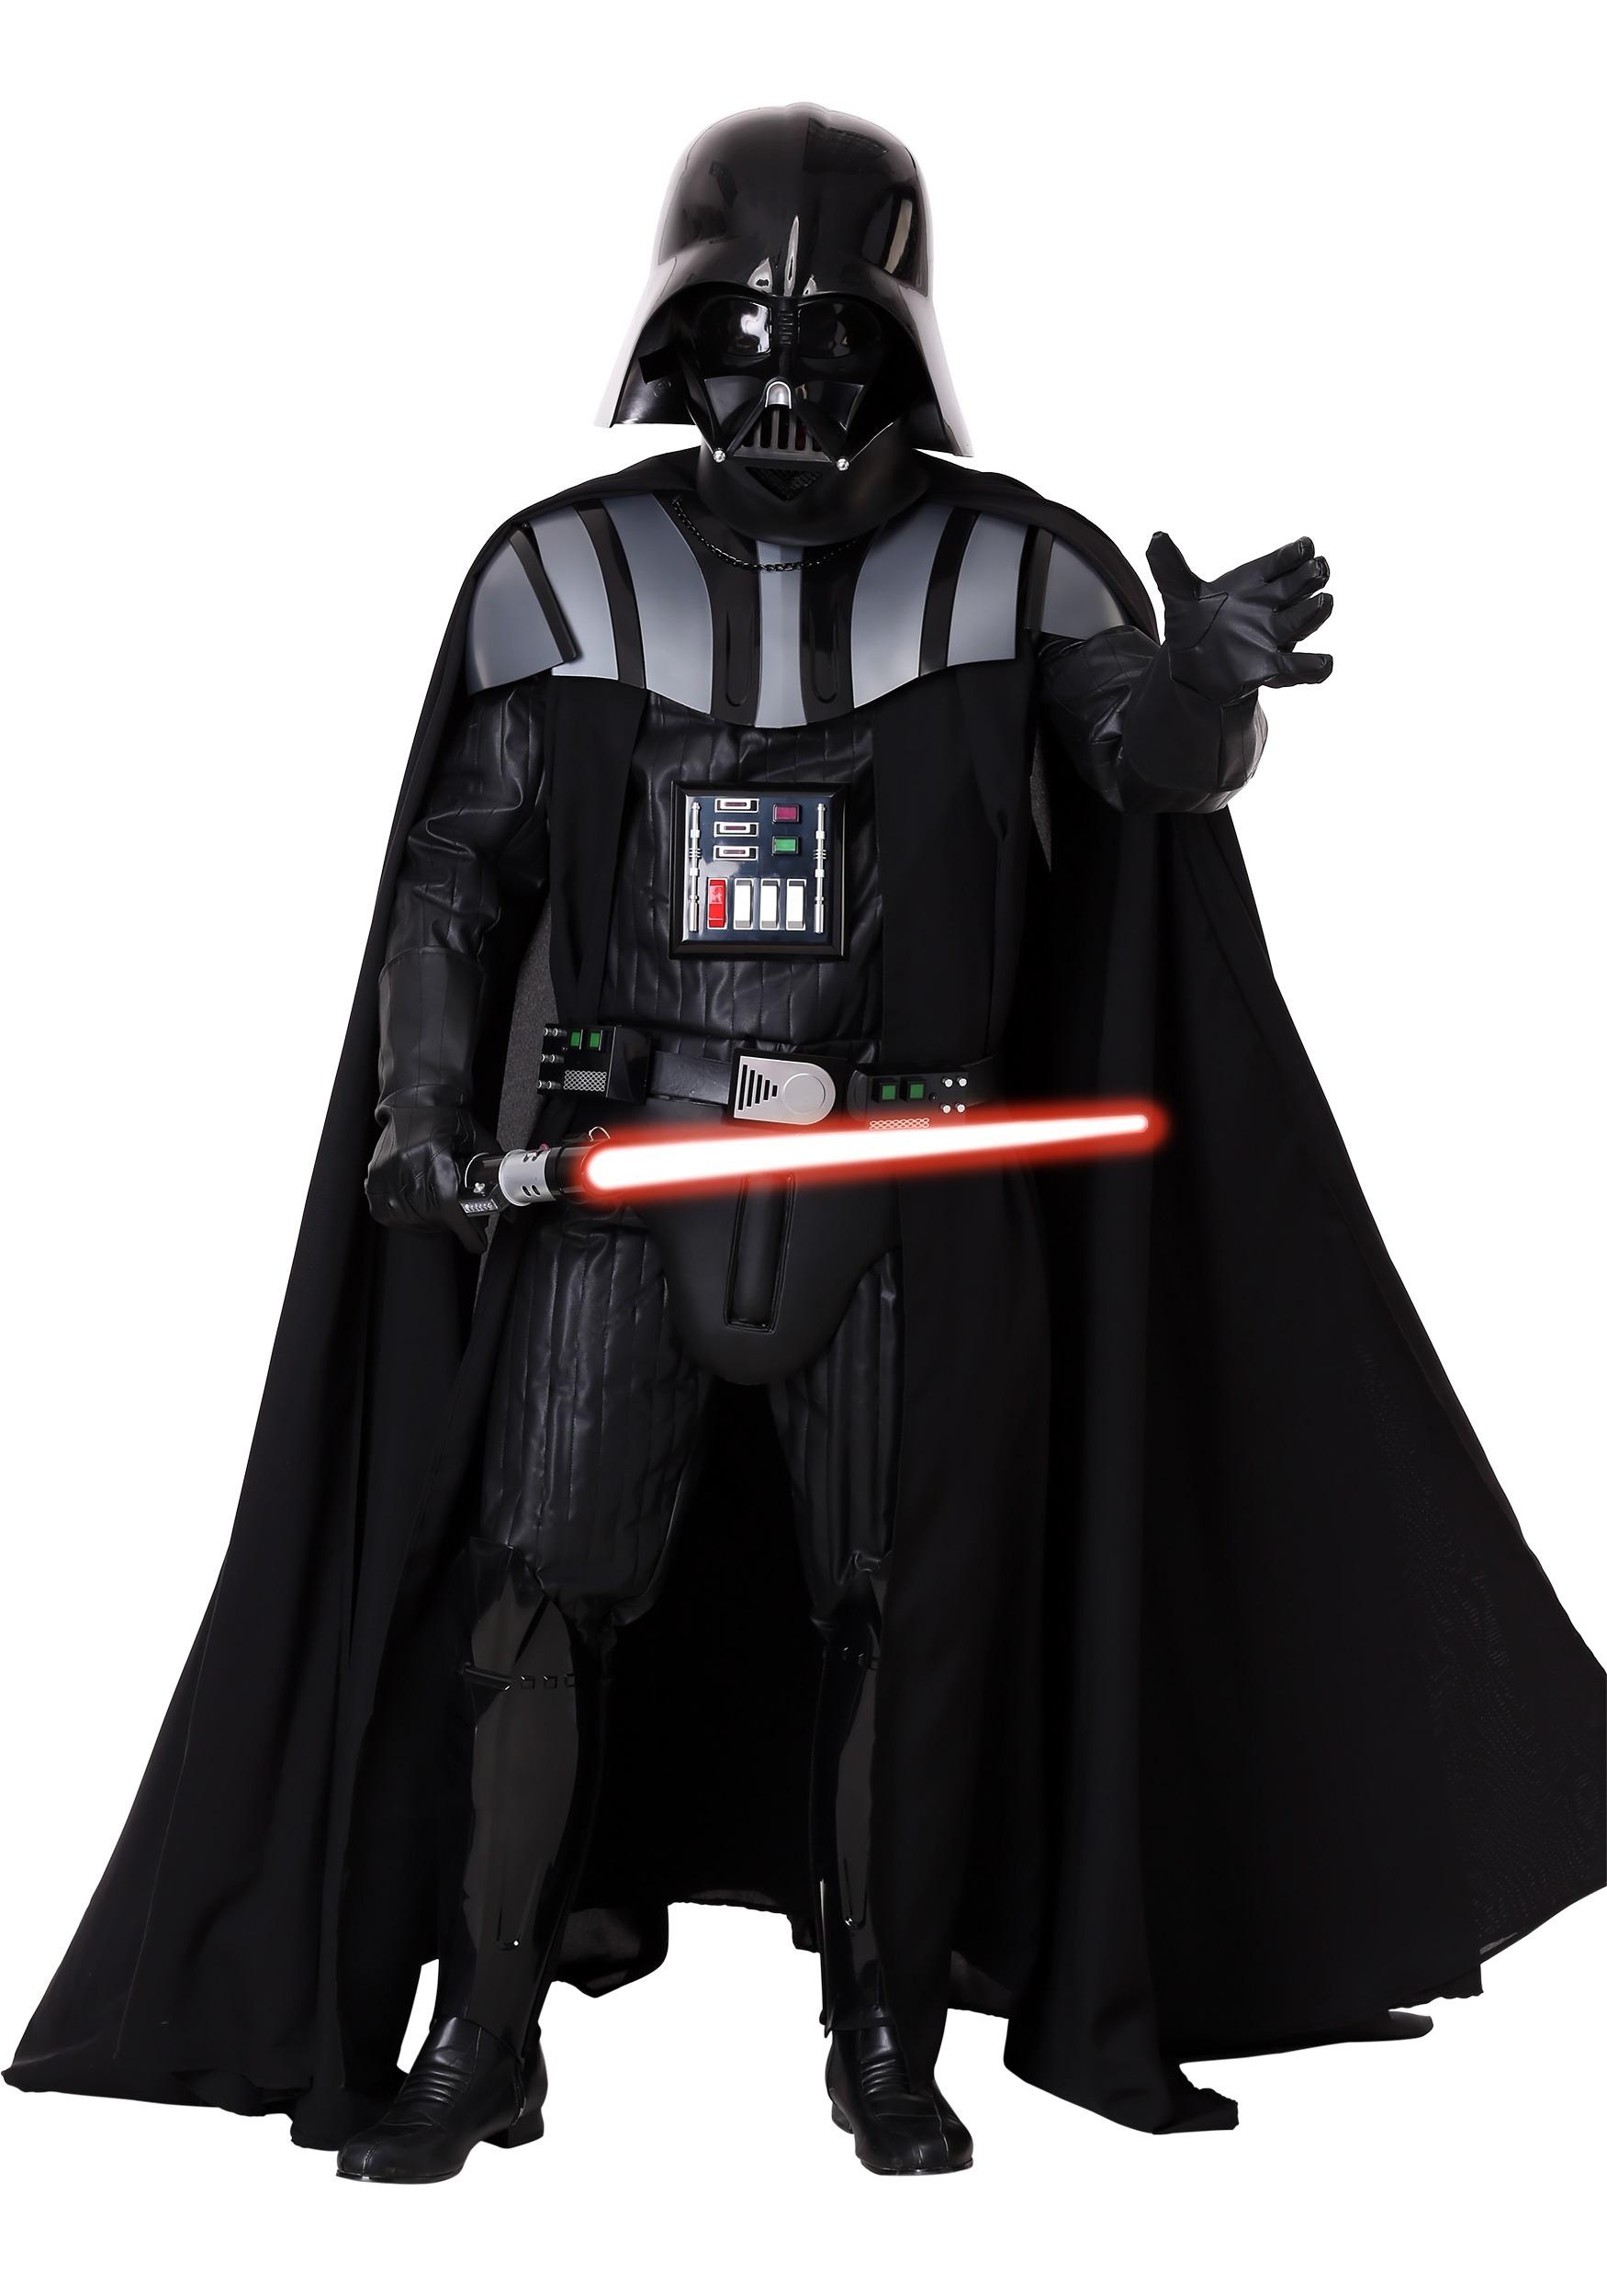 sc 1 st  Halloween Costumes UK & Authentic Darth Vader Costume